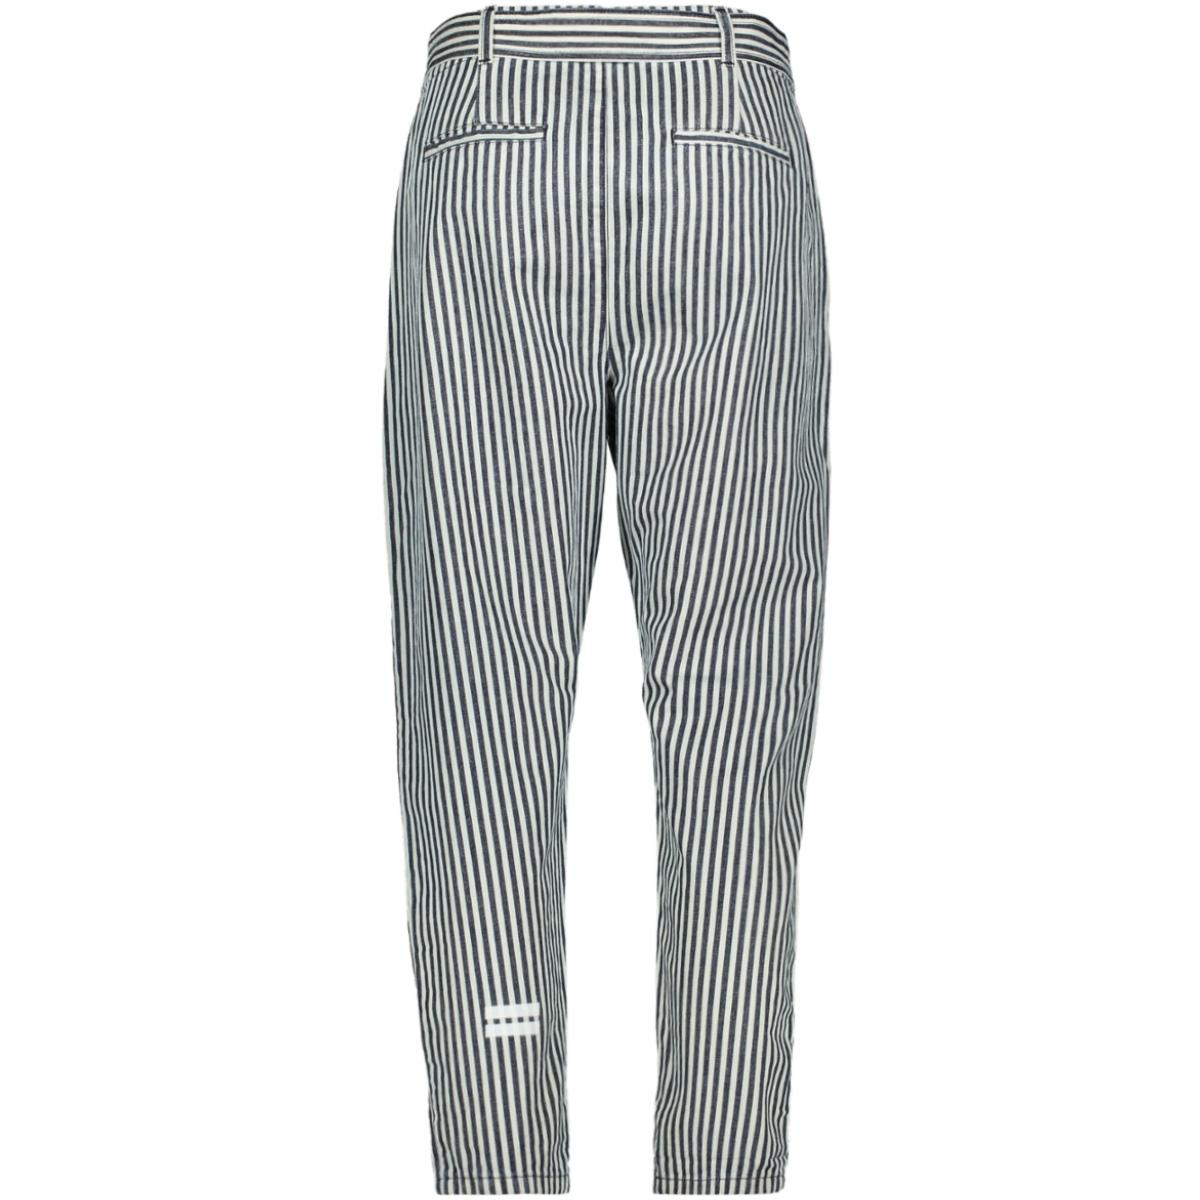 high waist pants 20 047 0201 10 days broek 1047 kit